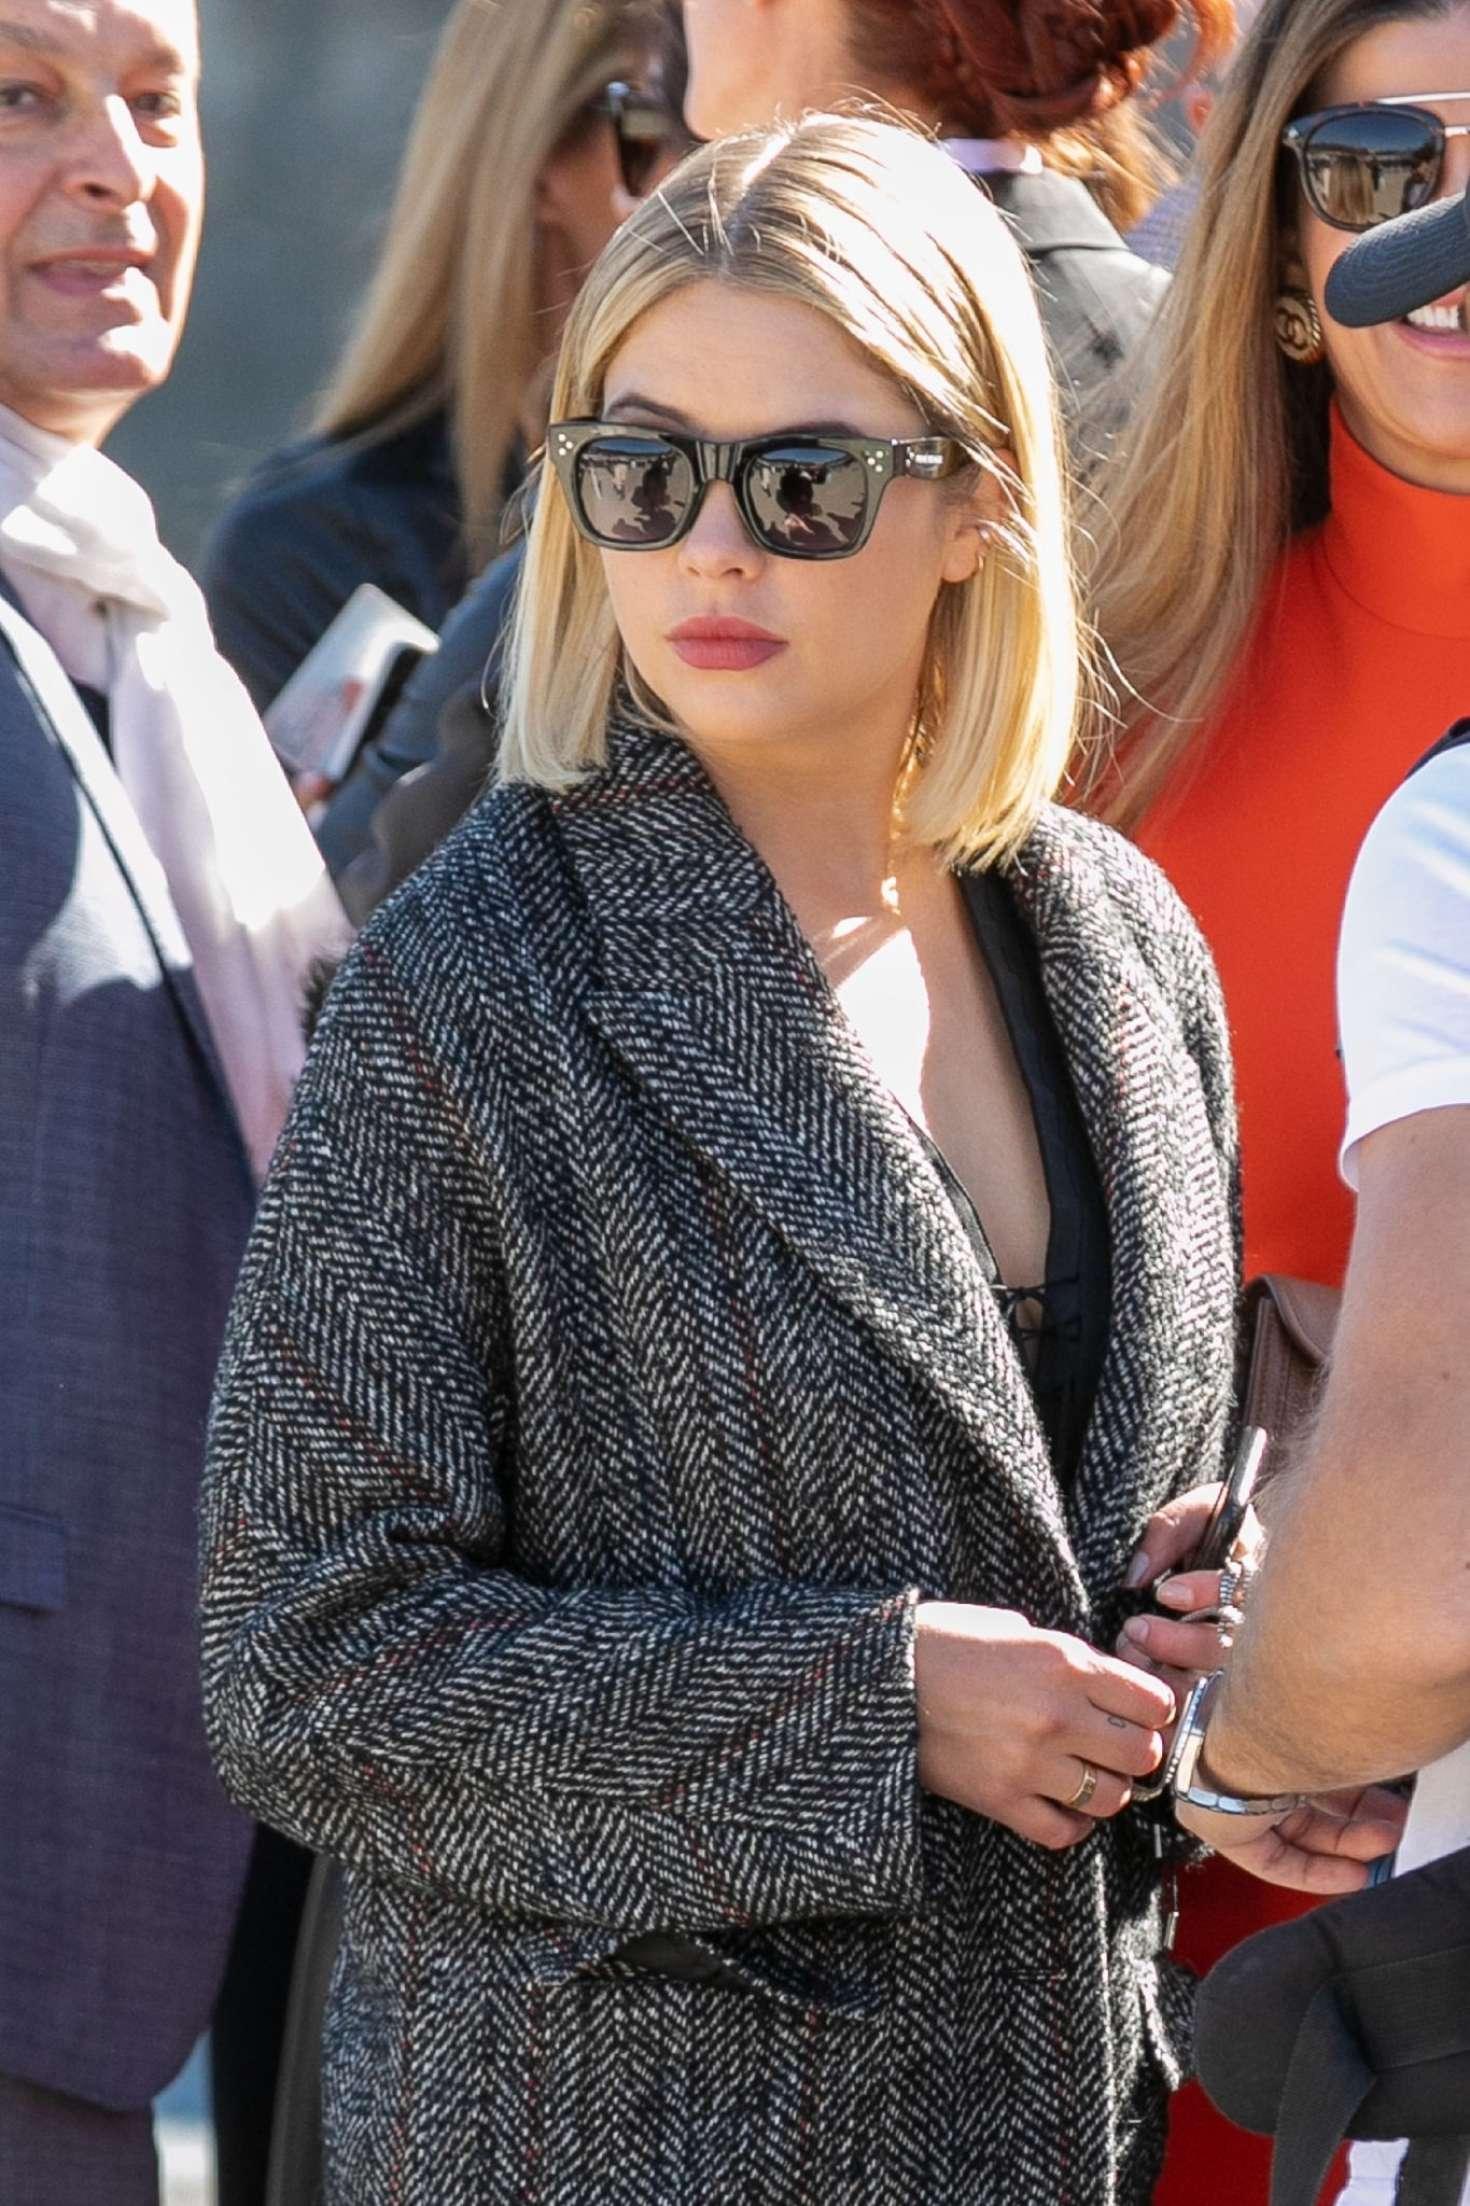 Ashley Benson - Attending the L'Oreal Fashion Show in Paris